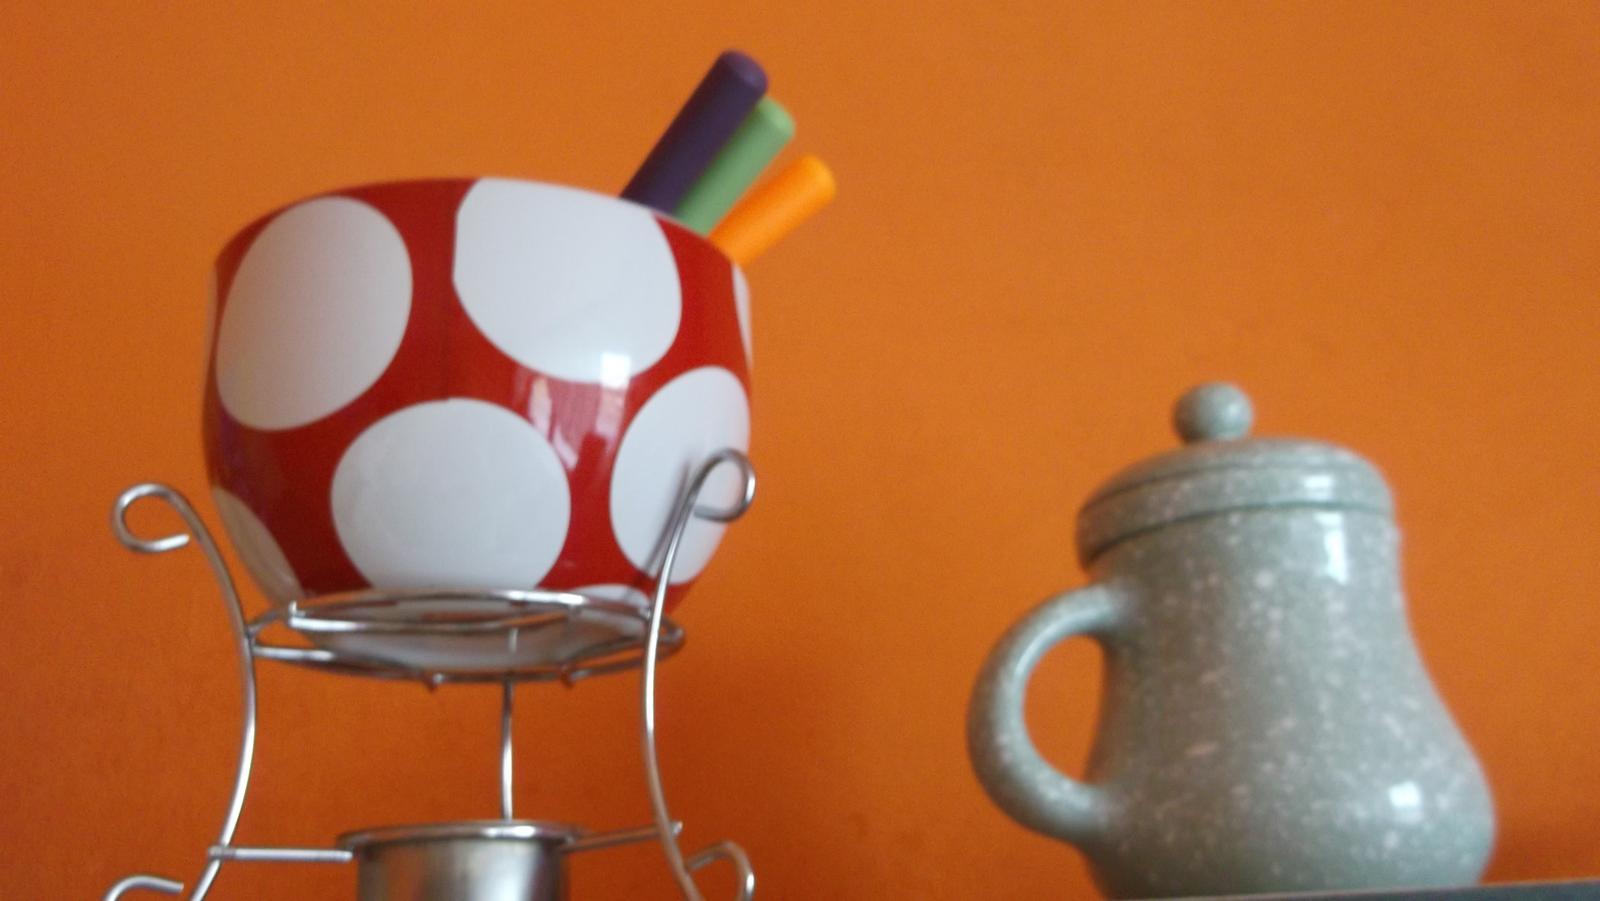 fondue - Obrázok č. 1